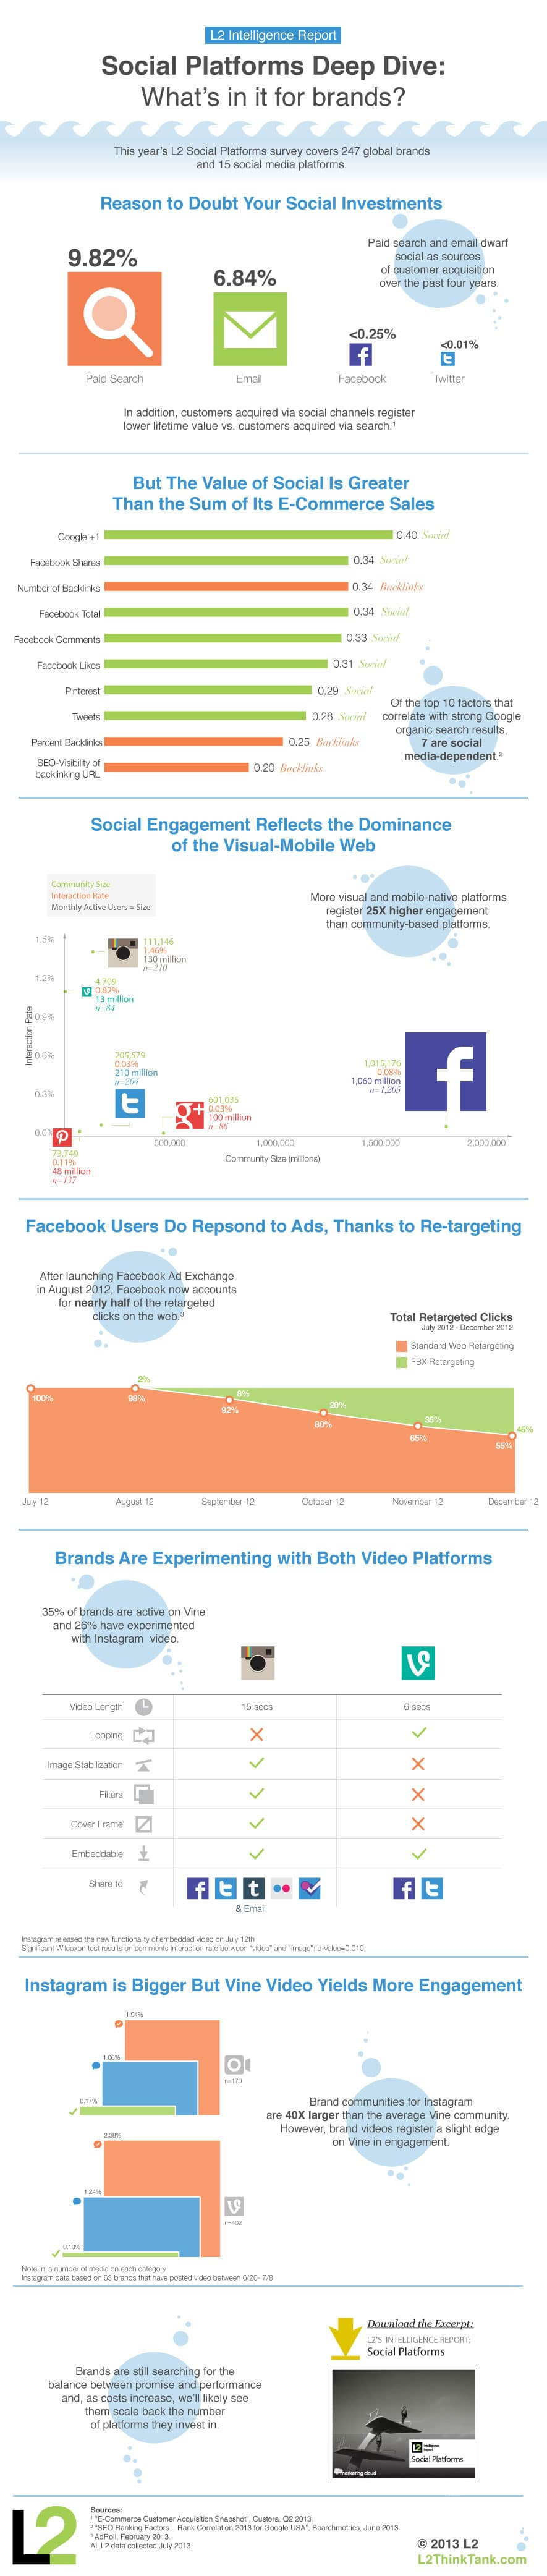 social-media-for-brands-infographic